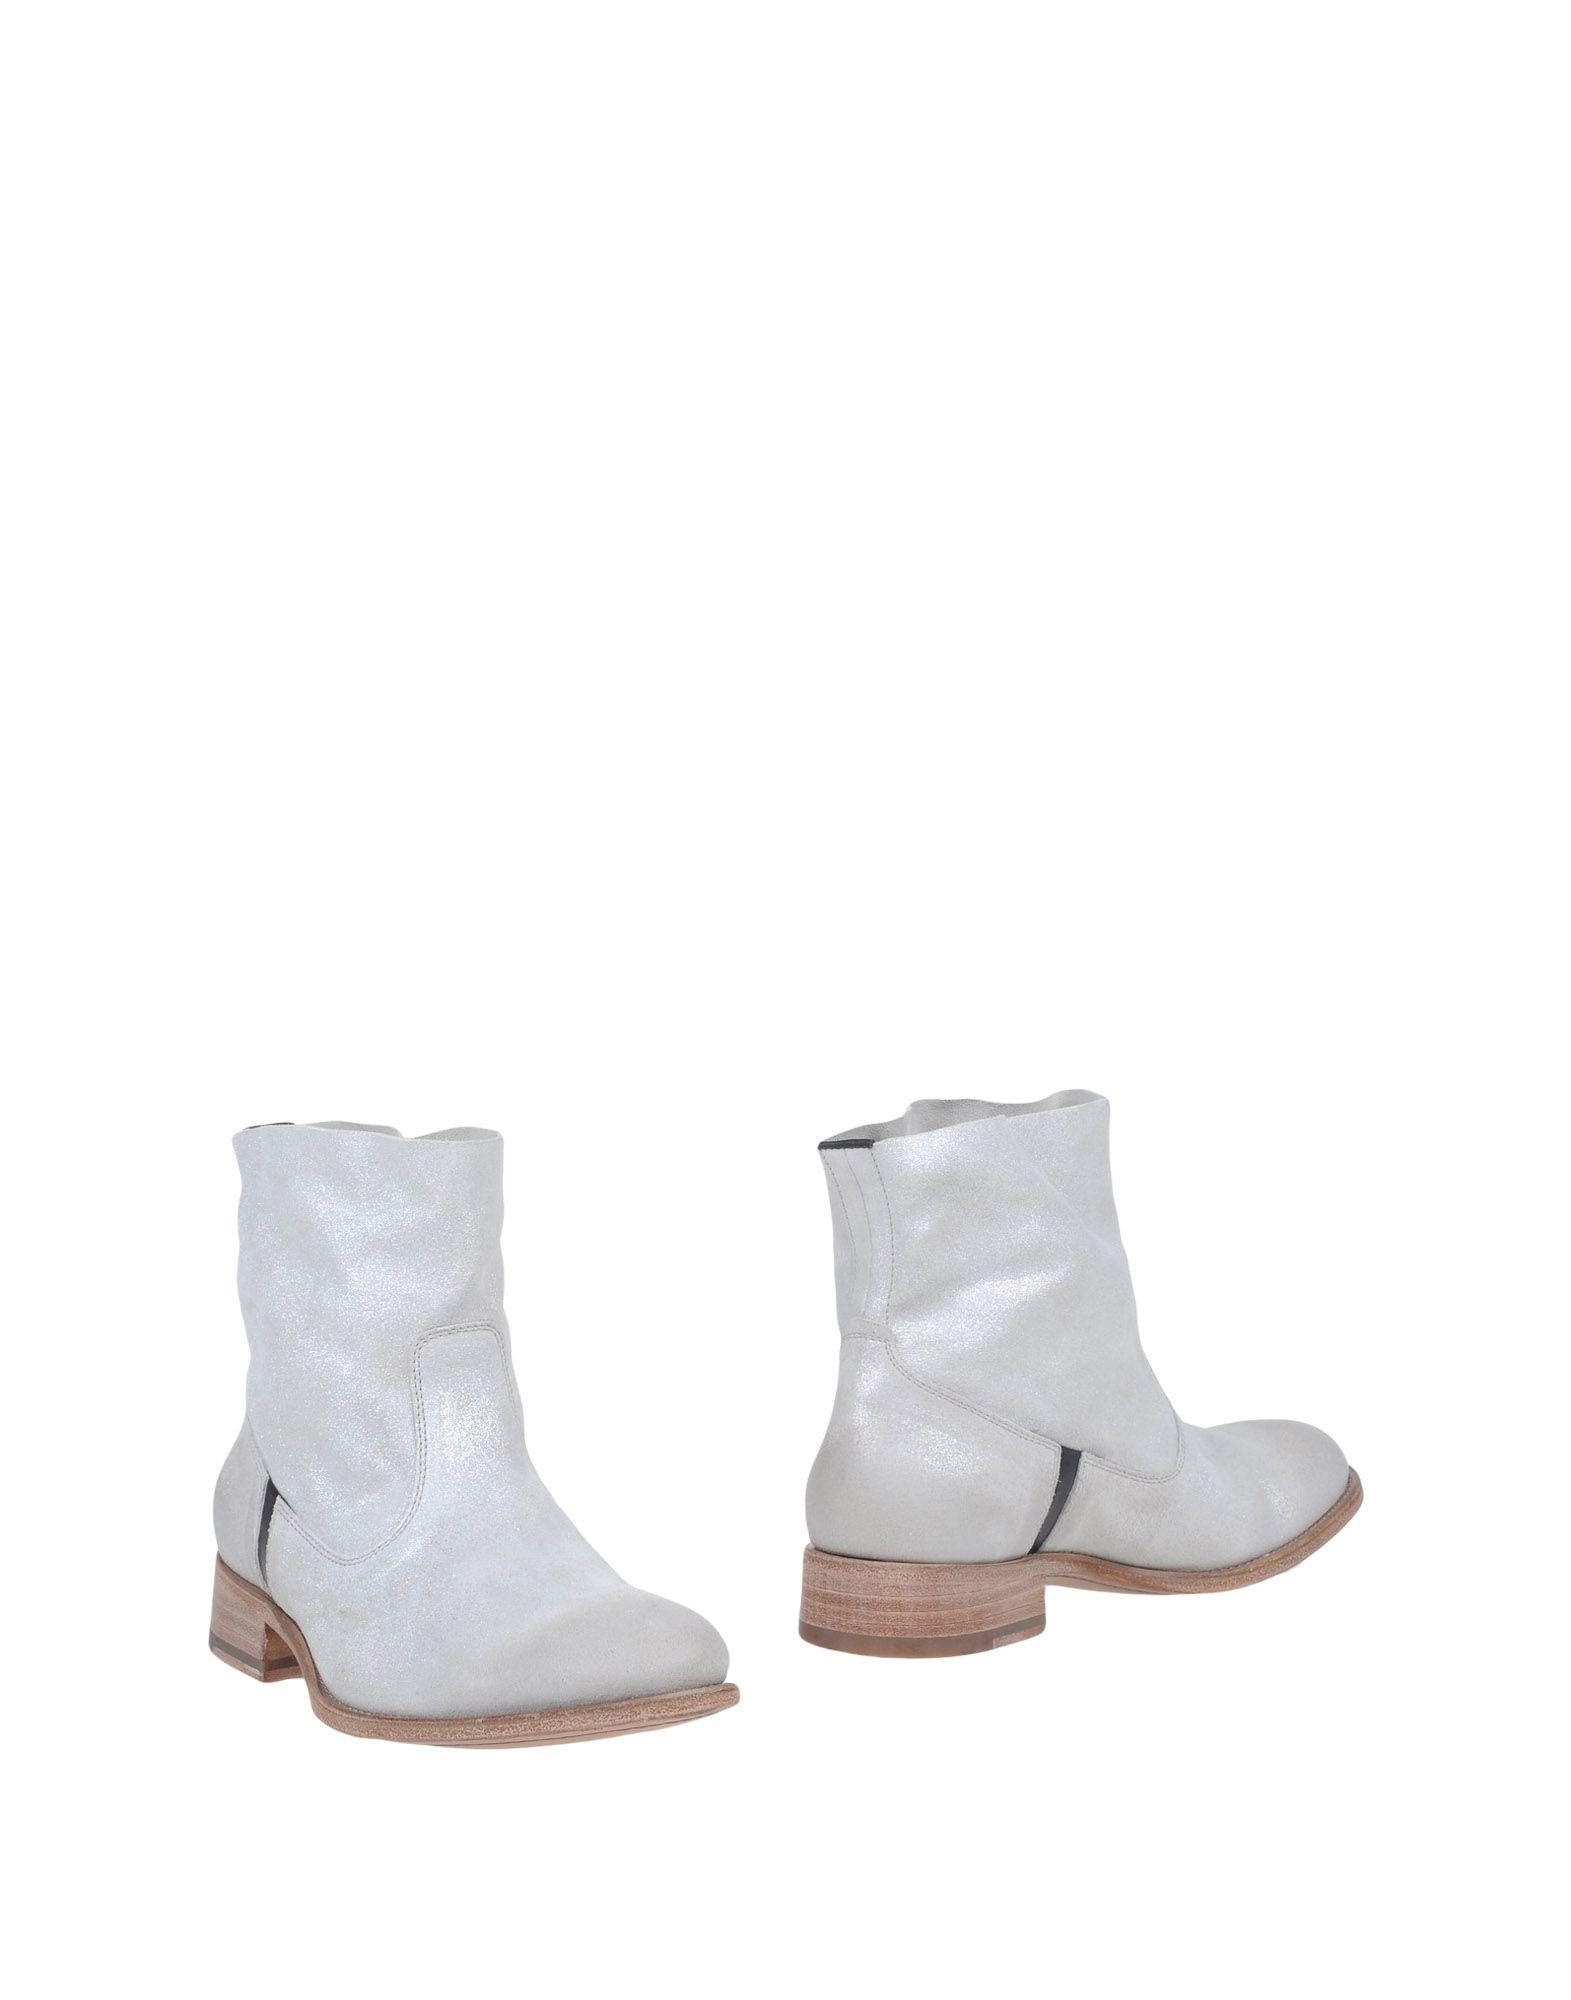 N.D.C. MADE BY HAND Полусапоги и высокие ботинки 2 made in italy полусапоги и высокие ботинки